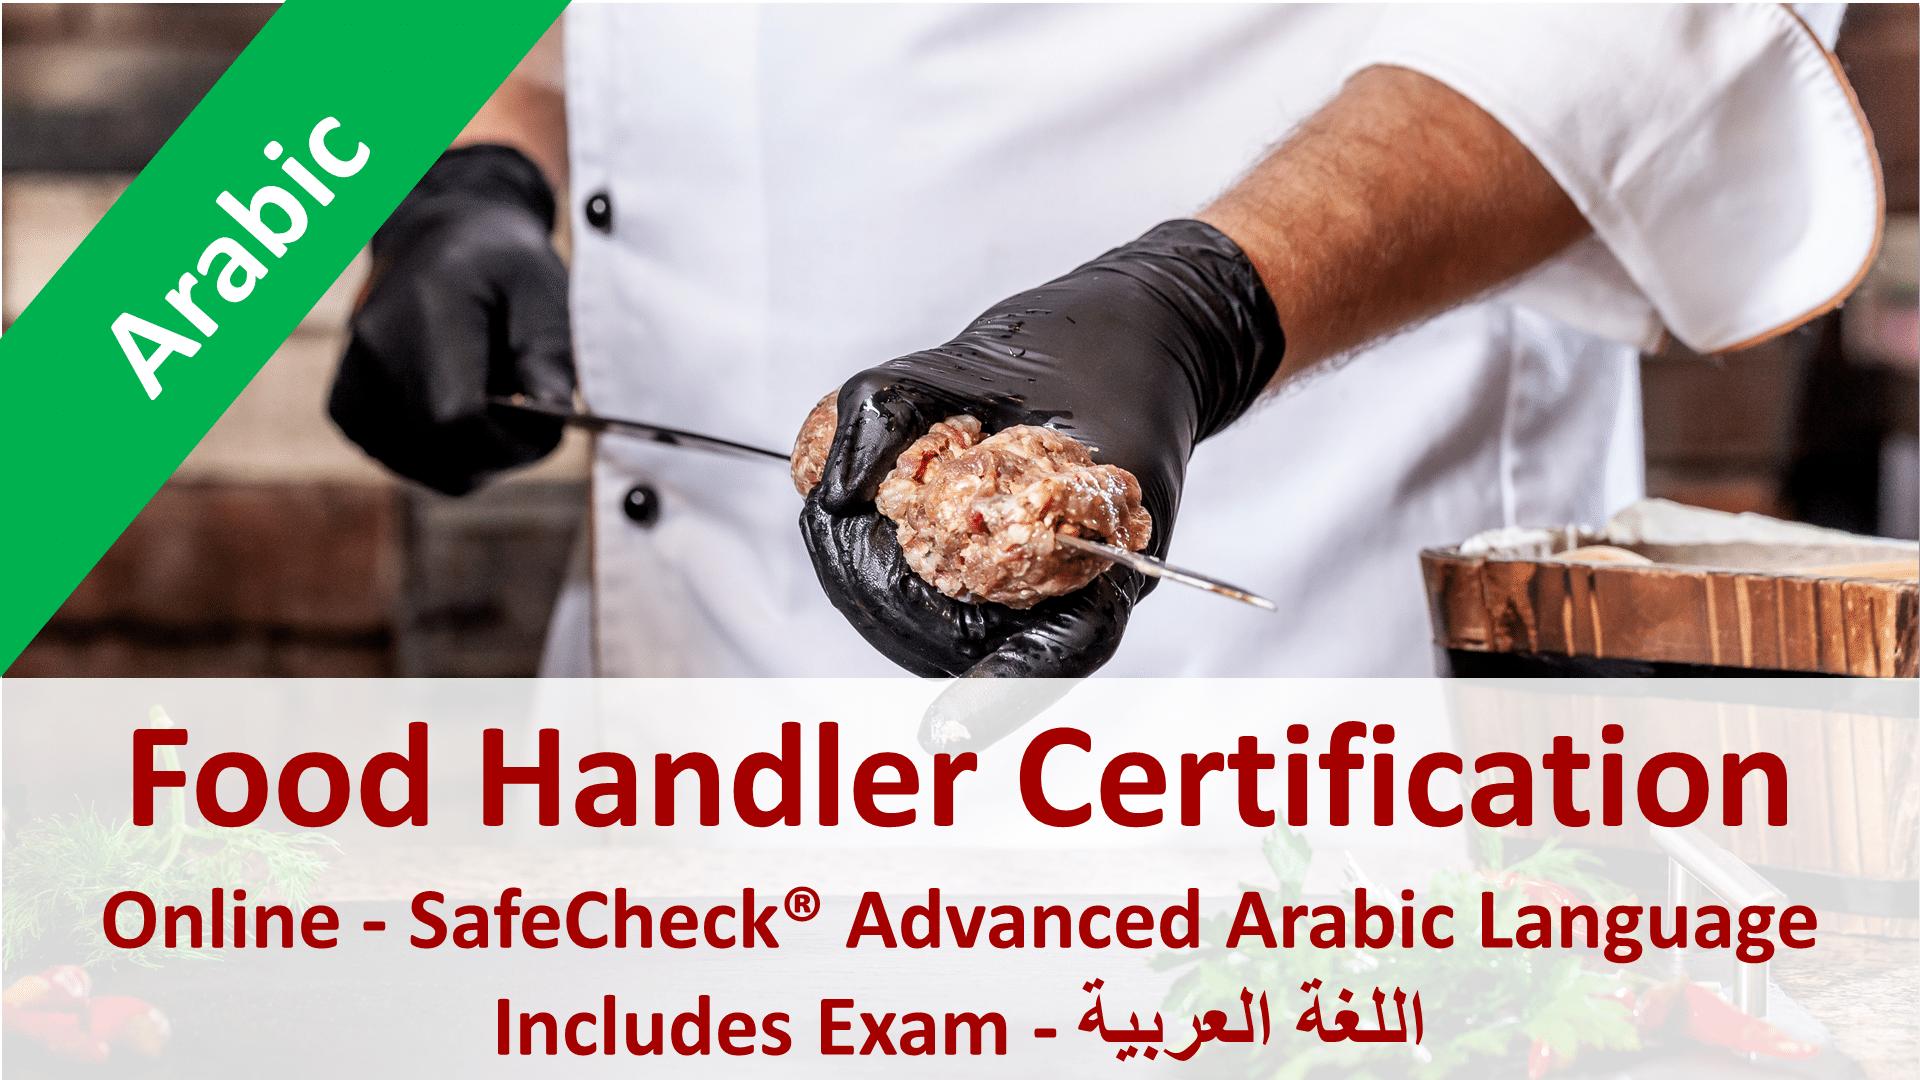 Arabic Language Food Handler Course, Canada's Best Price